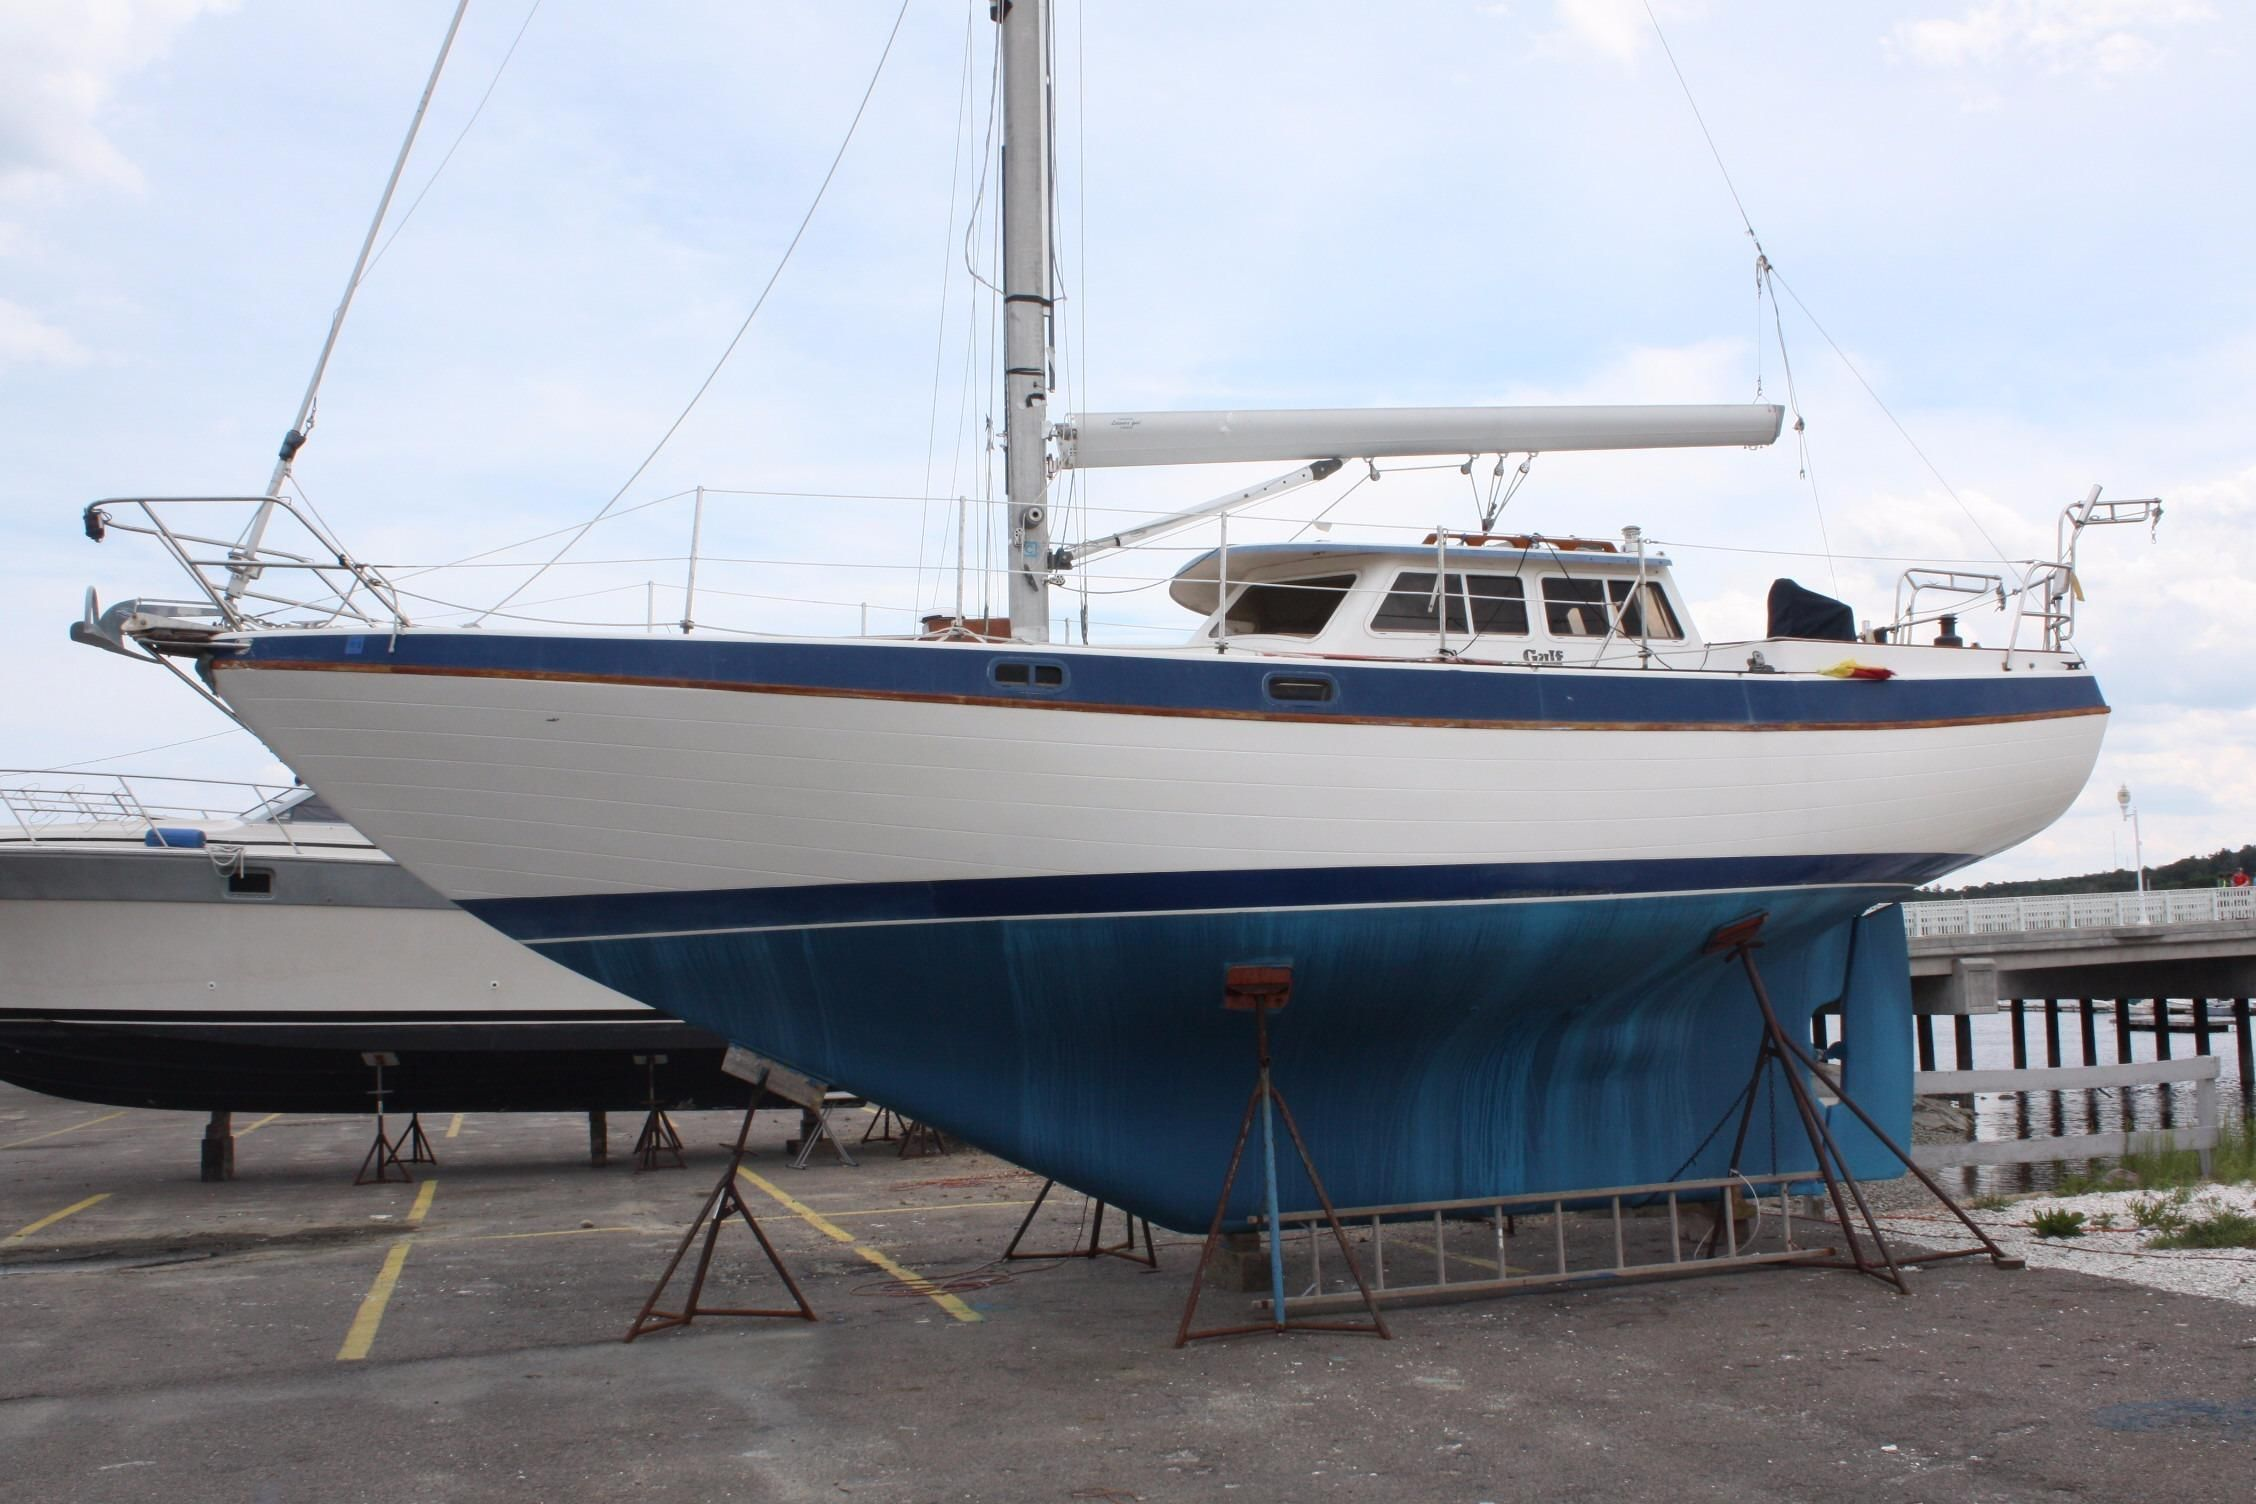 1986 Capital Gulf 32 Sail Boat For Sale - www yachtworld com